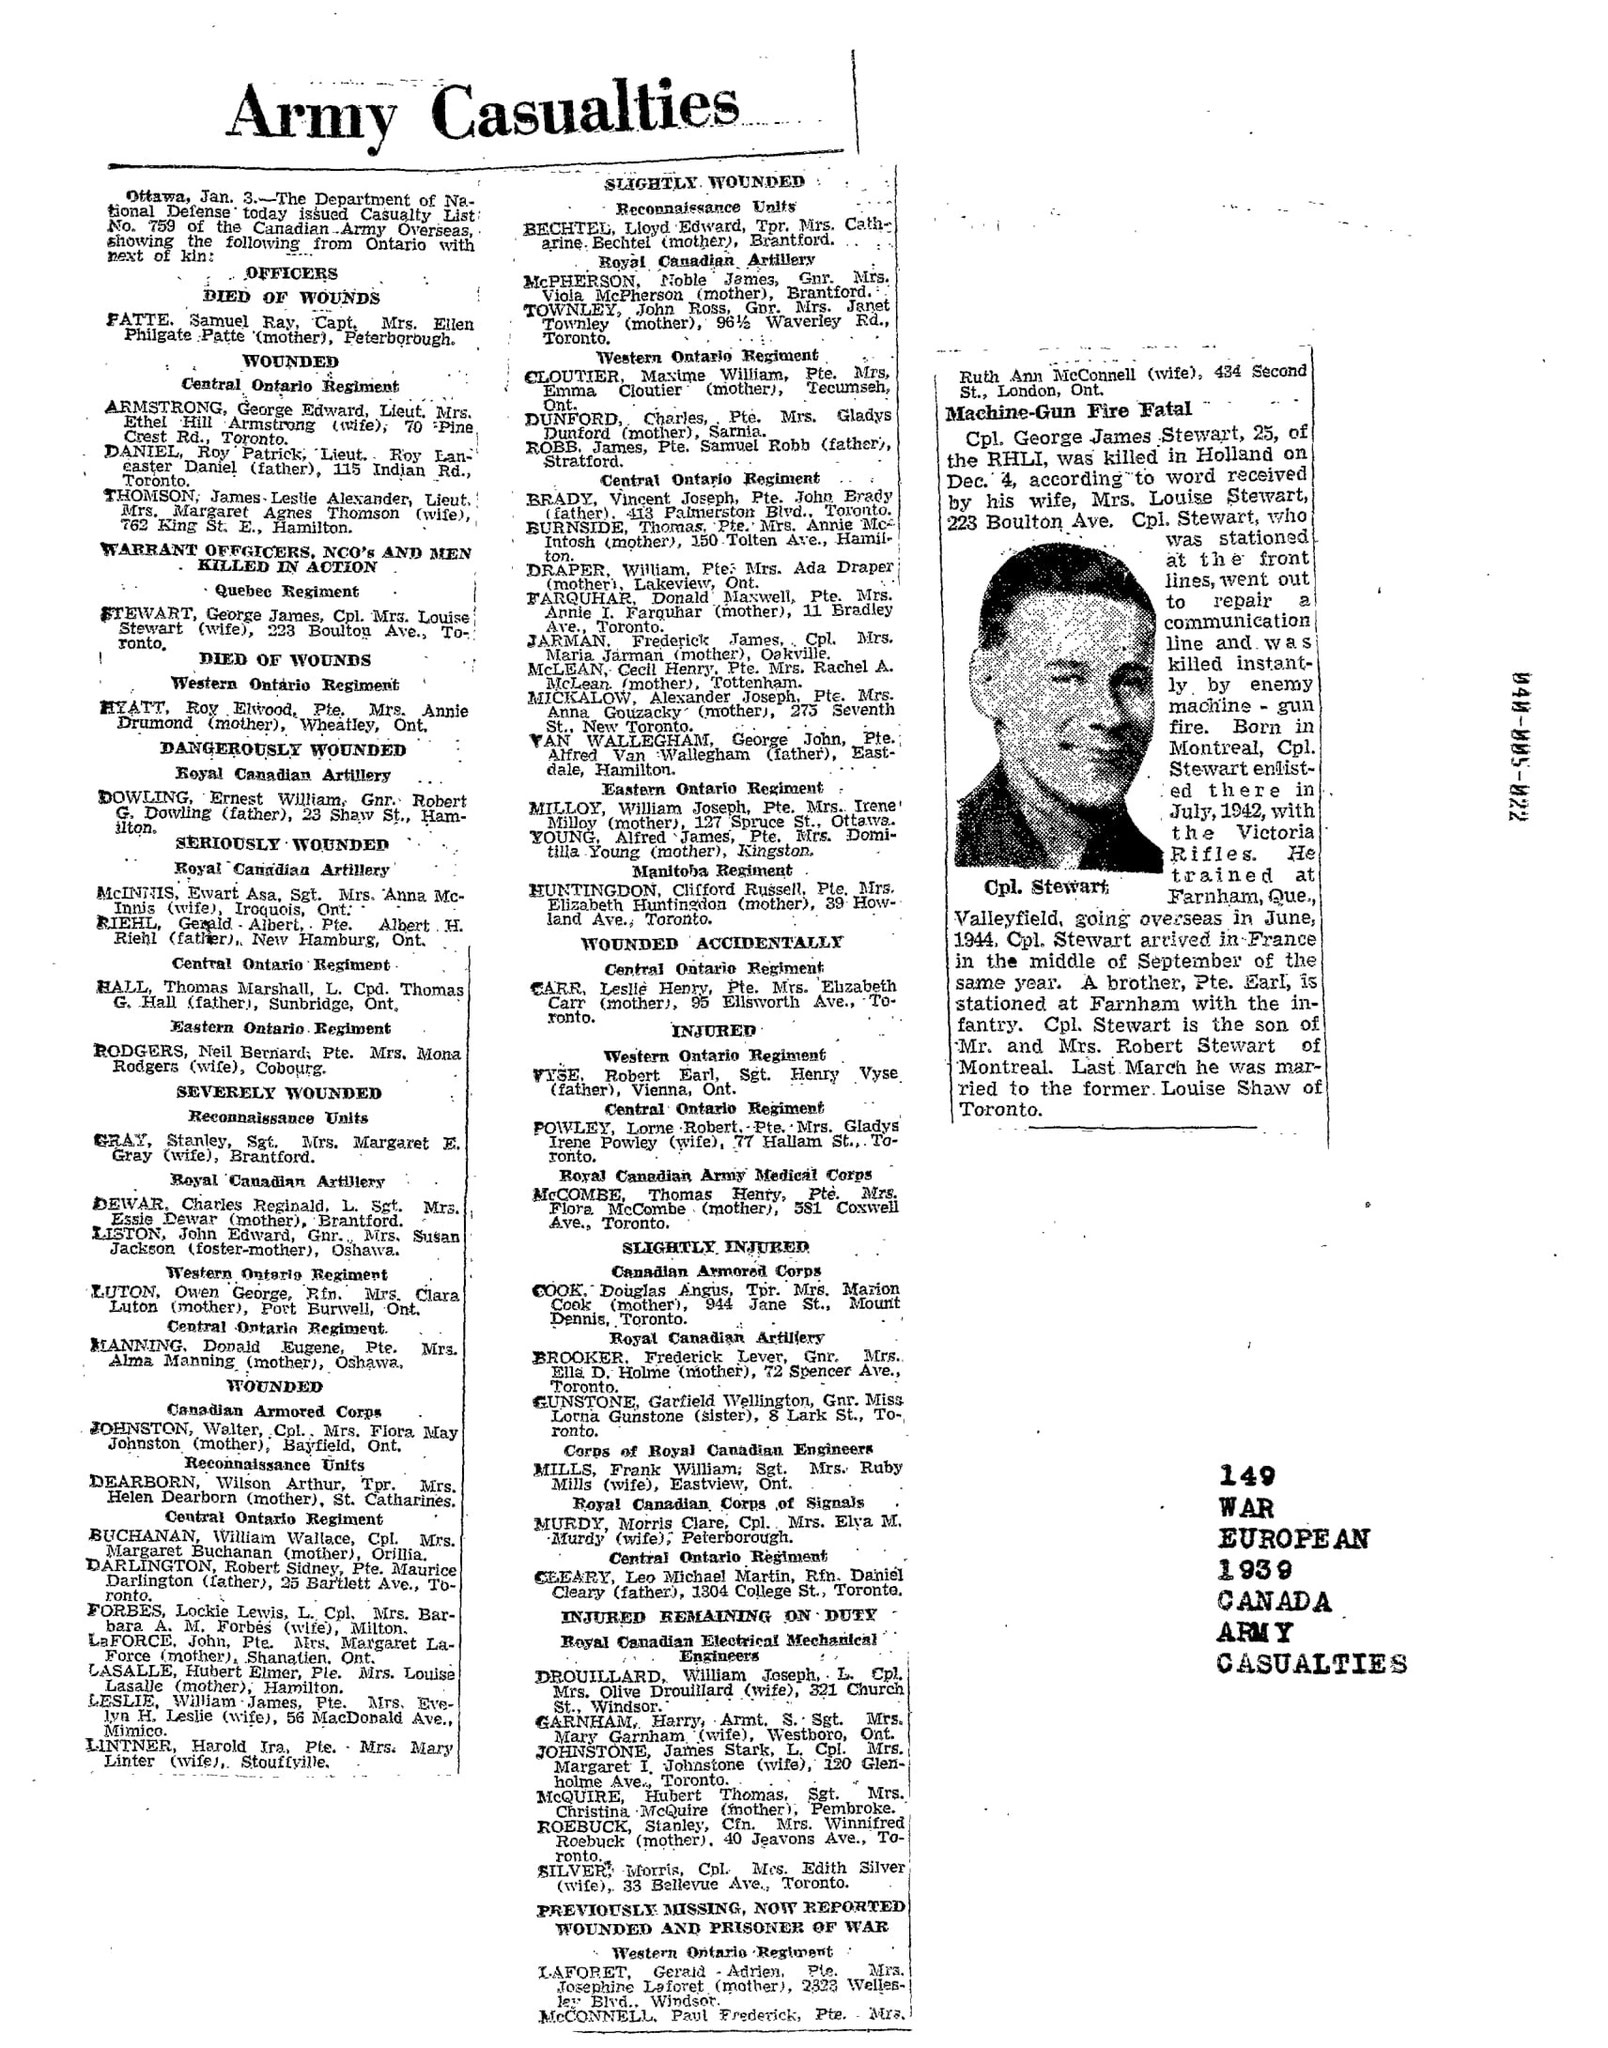 Globe and Mail 4-1-1945